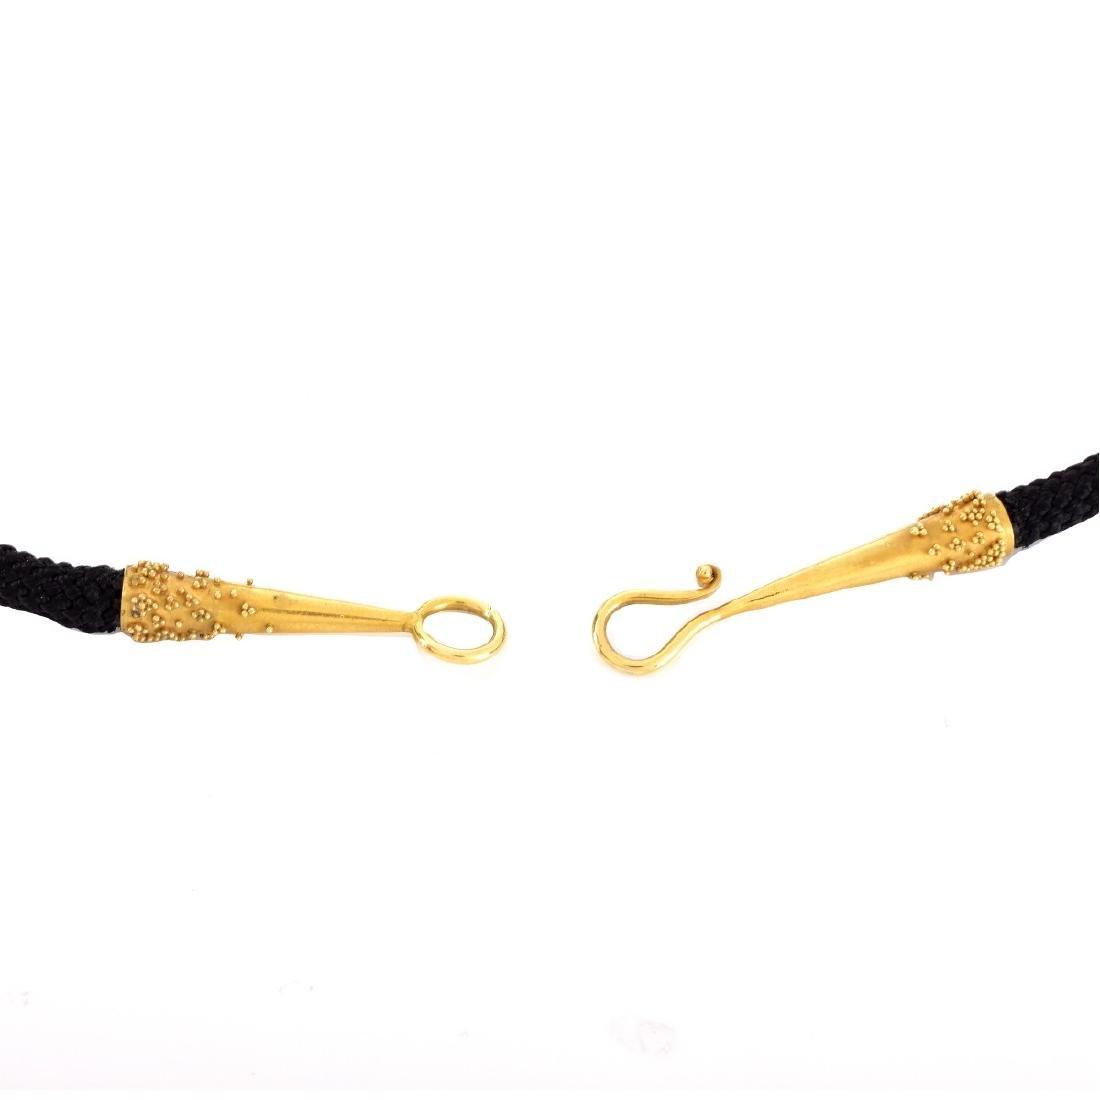 18K Gold Scorpion Pendant Necklace - 4